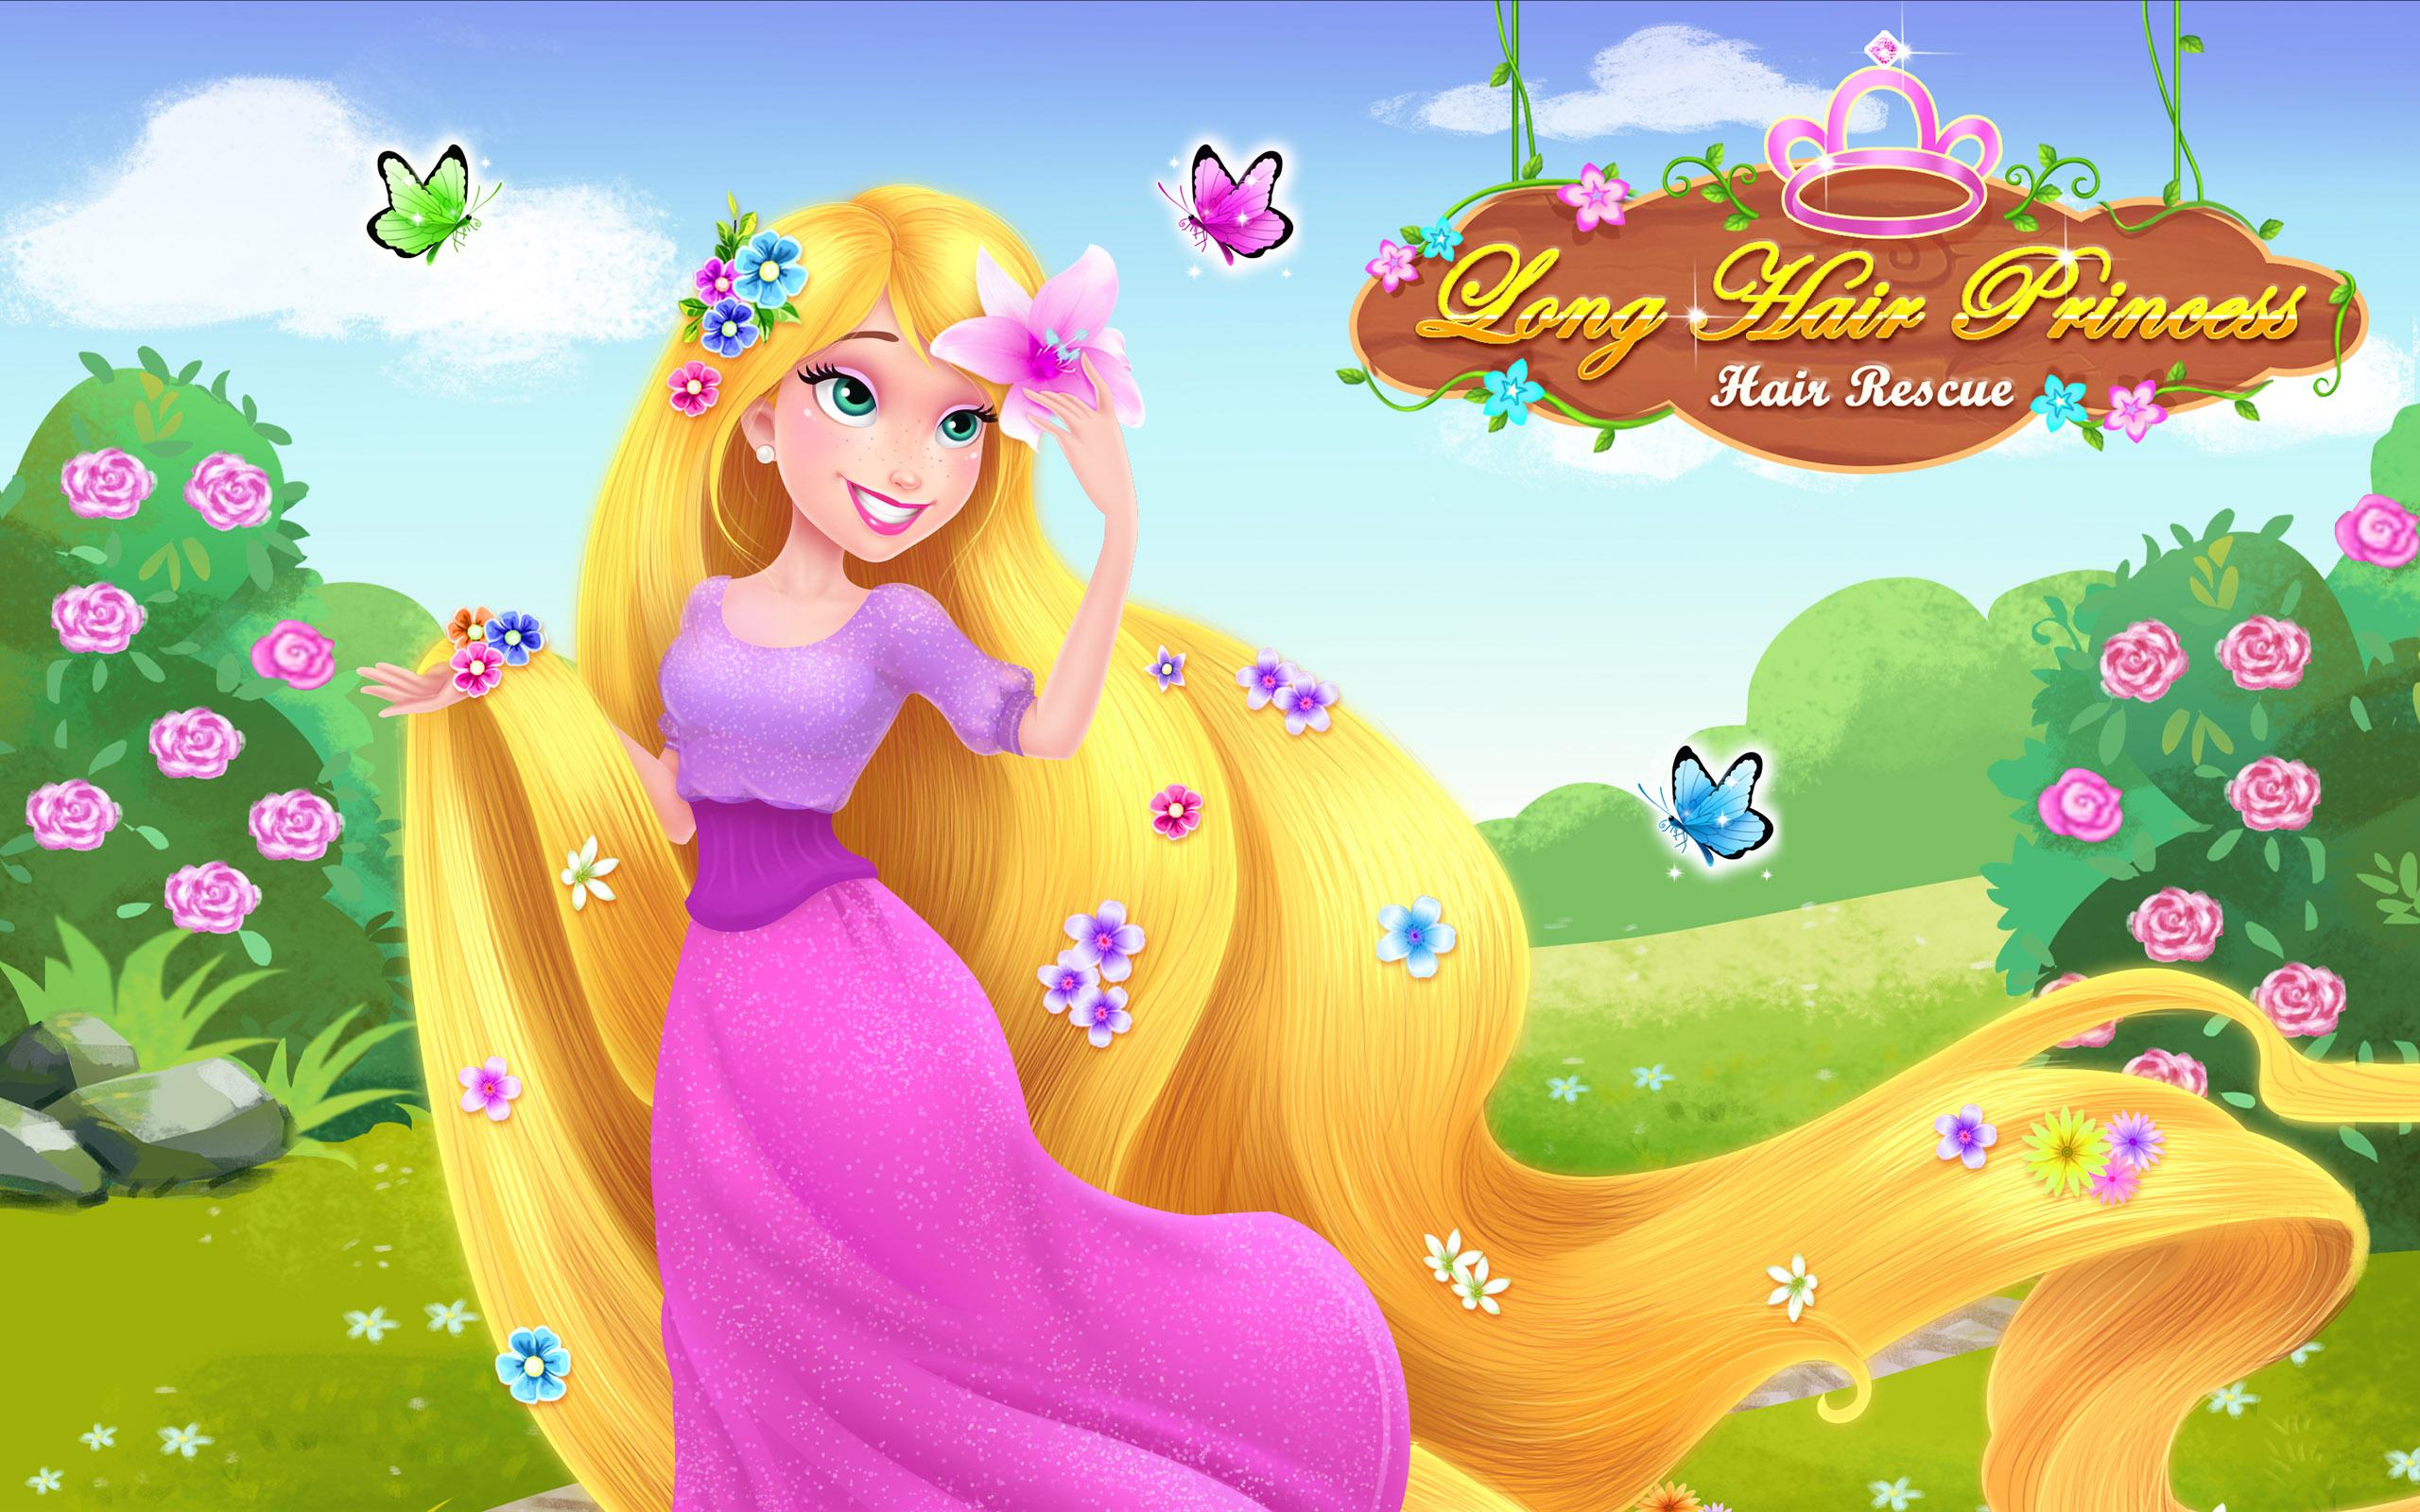 long hair princess - prince rescue